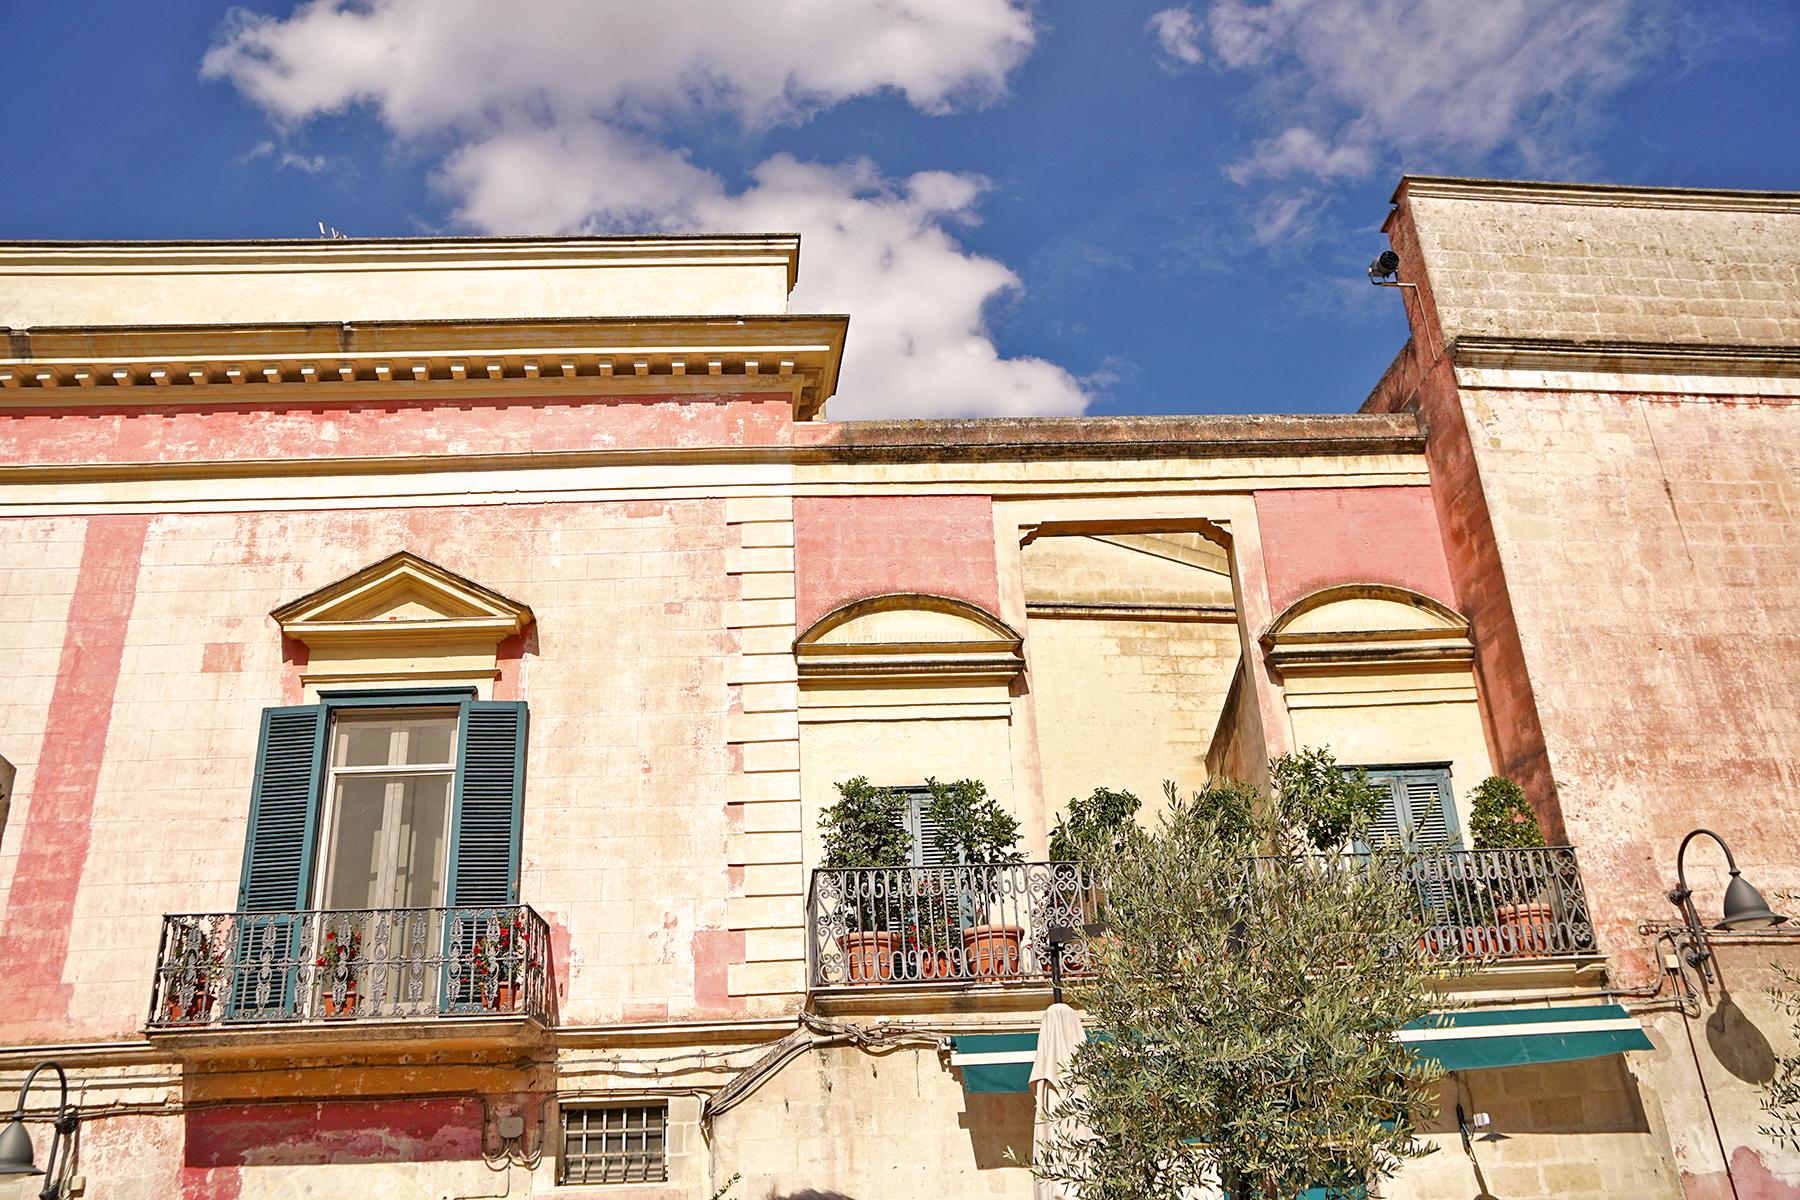 Maison rose Matera, Italie